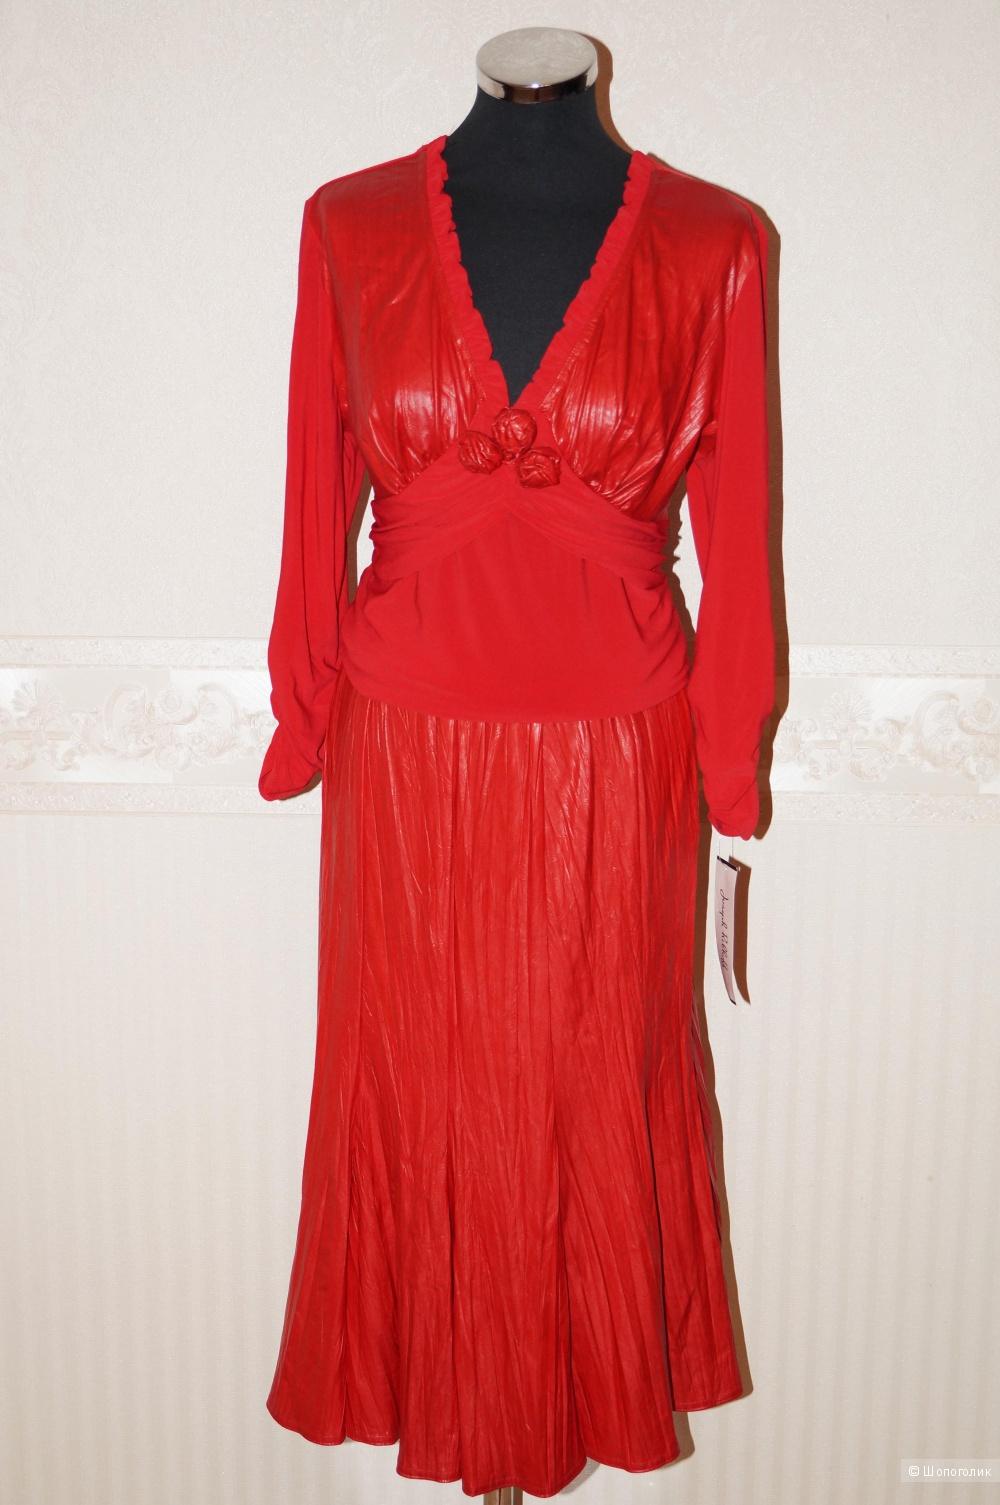 46 размер юбки